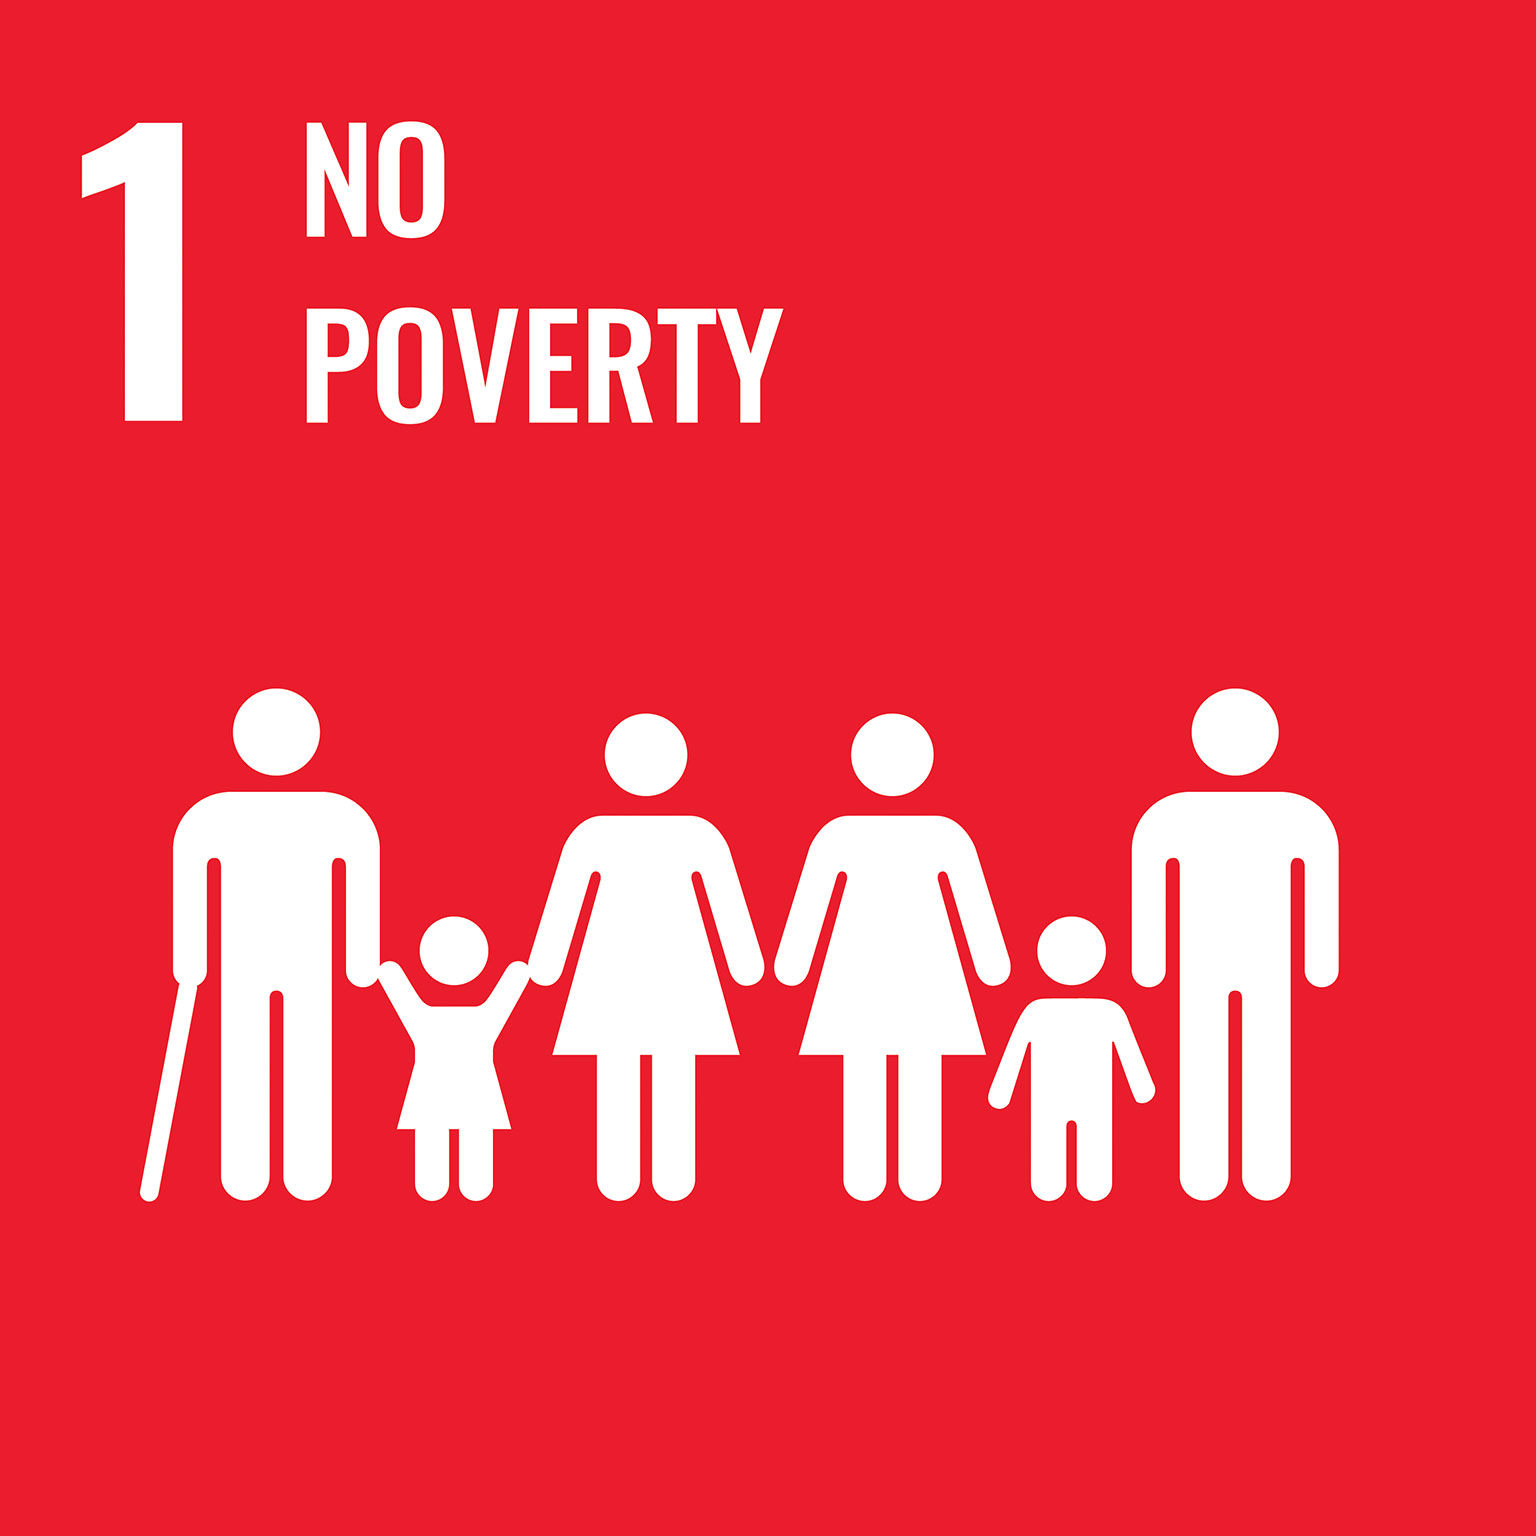 sustainable development goals: no poverty